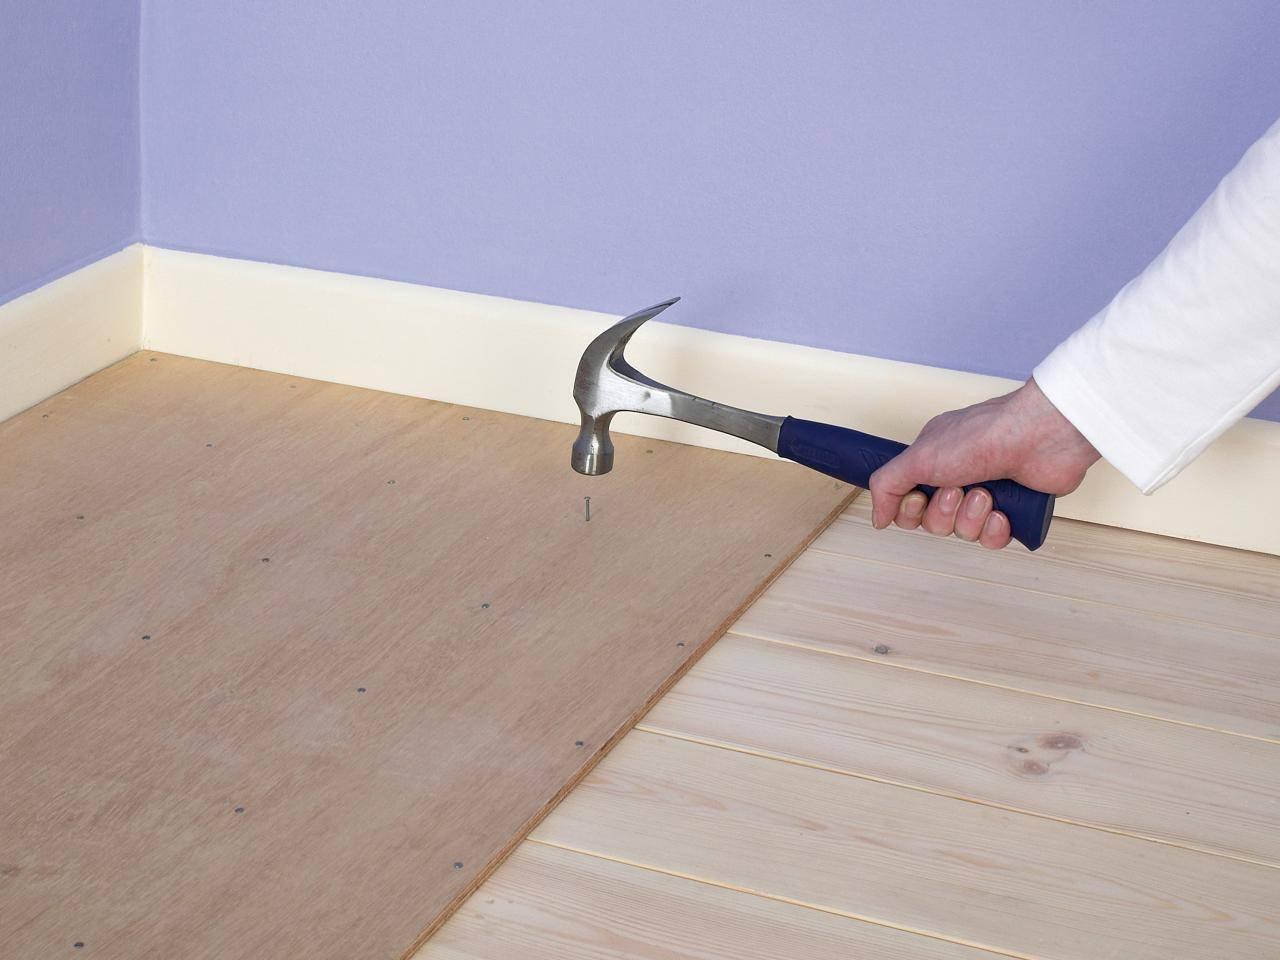 Отделка стен ламинатом: как закрепить ламинат на стене